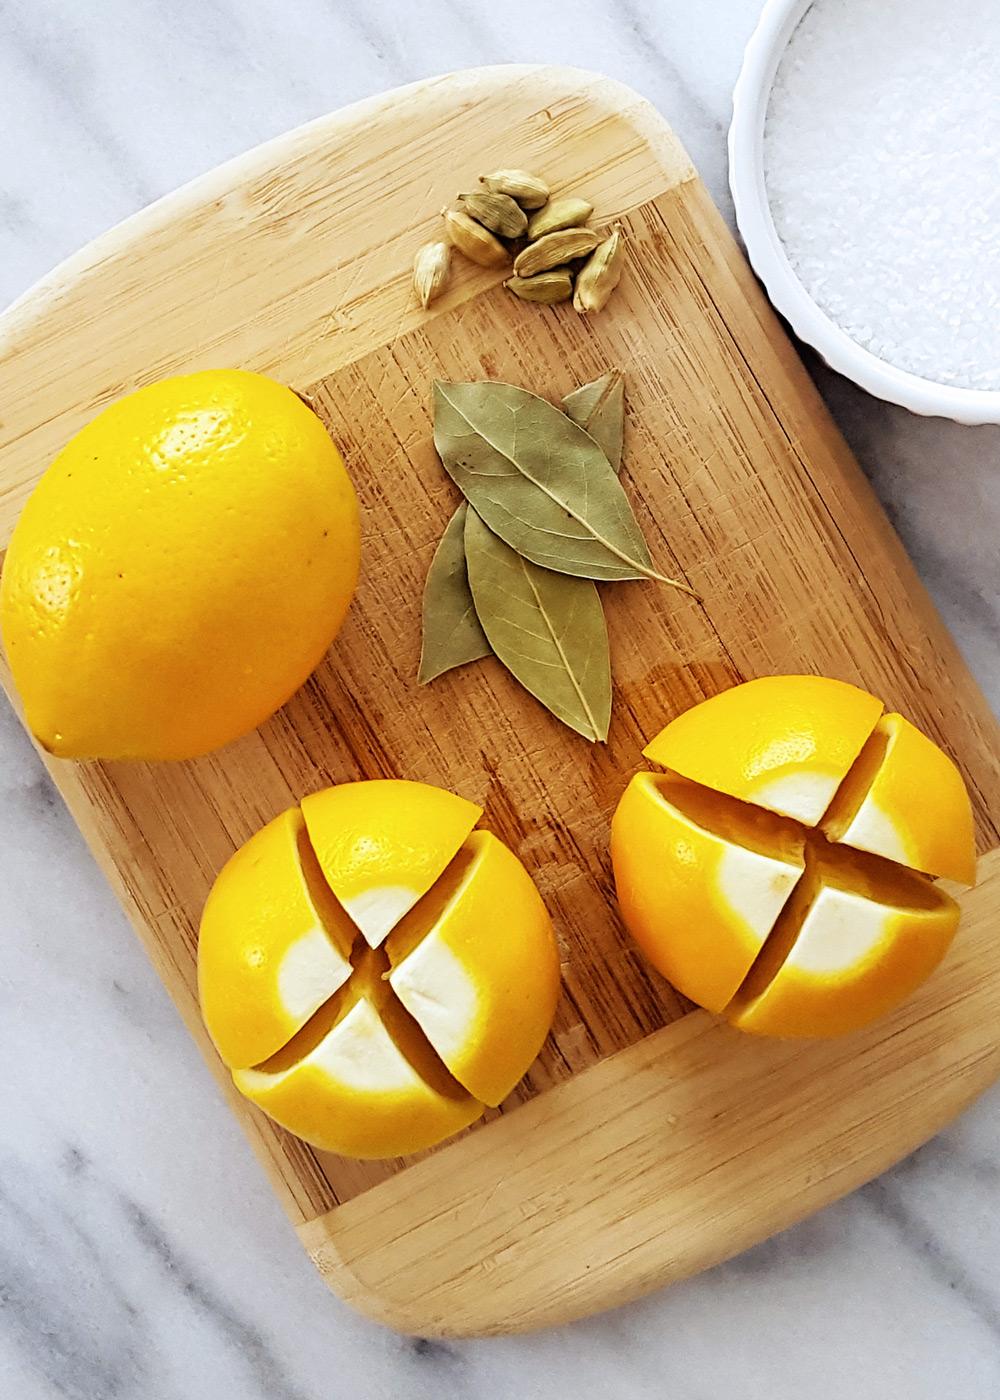 Prepping Meyer Lemons for preserving. | FeastInThyme.com